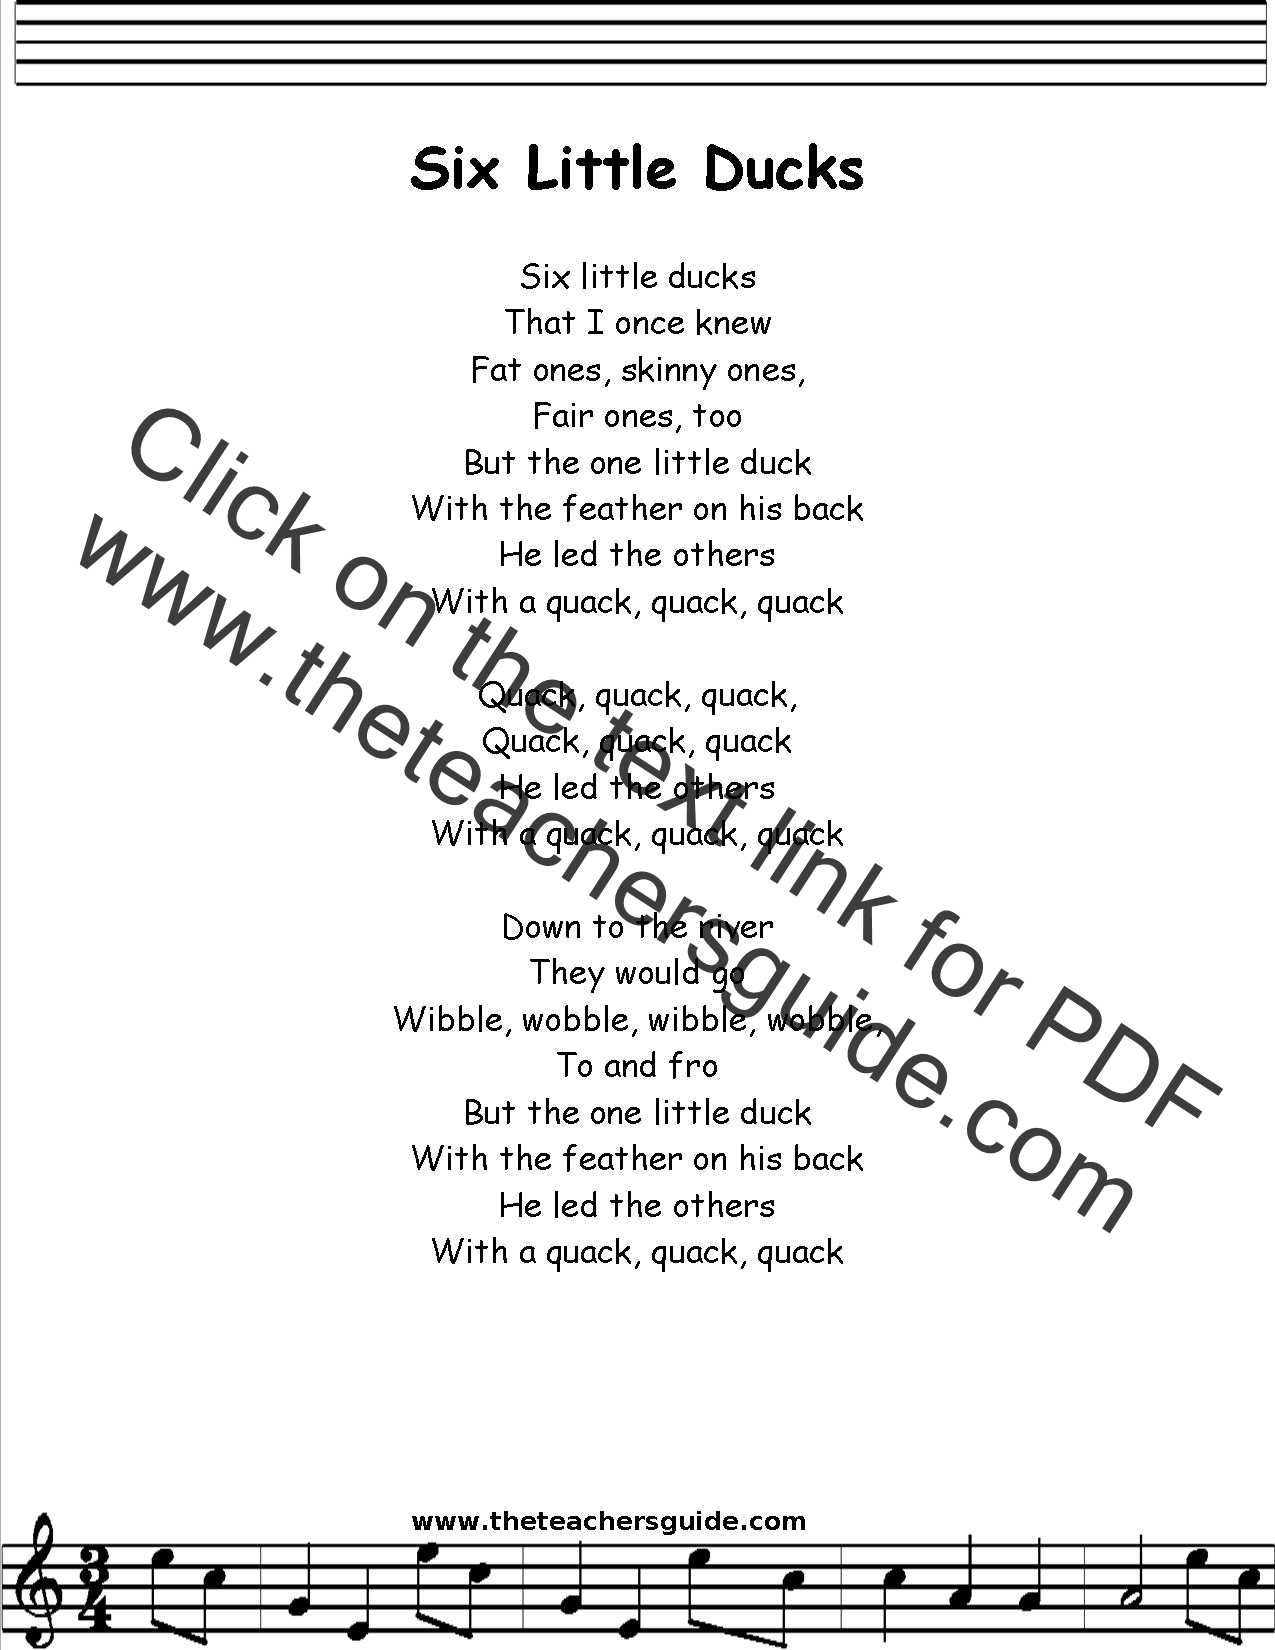 Six Little Ducks Lyrics Printout Midi And Video